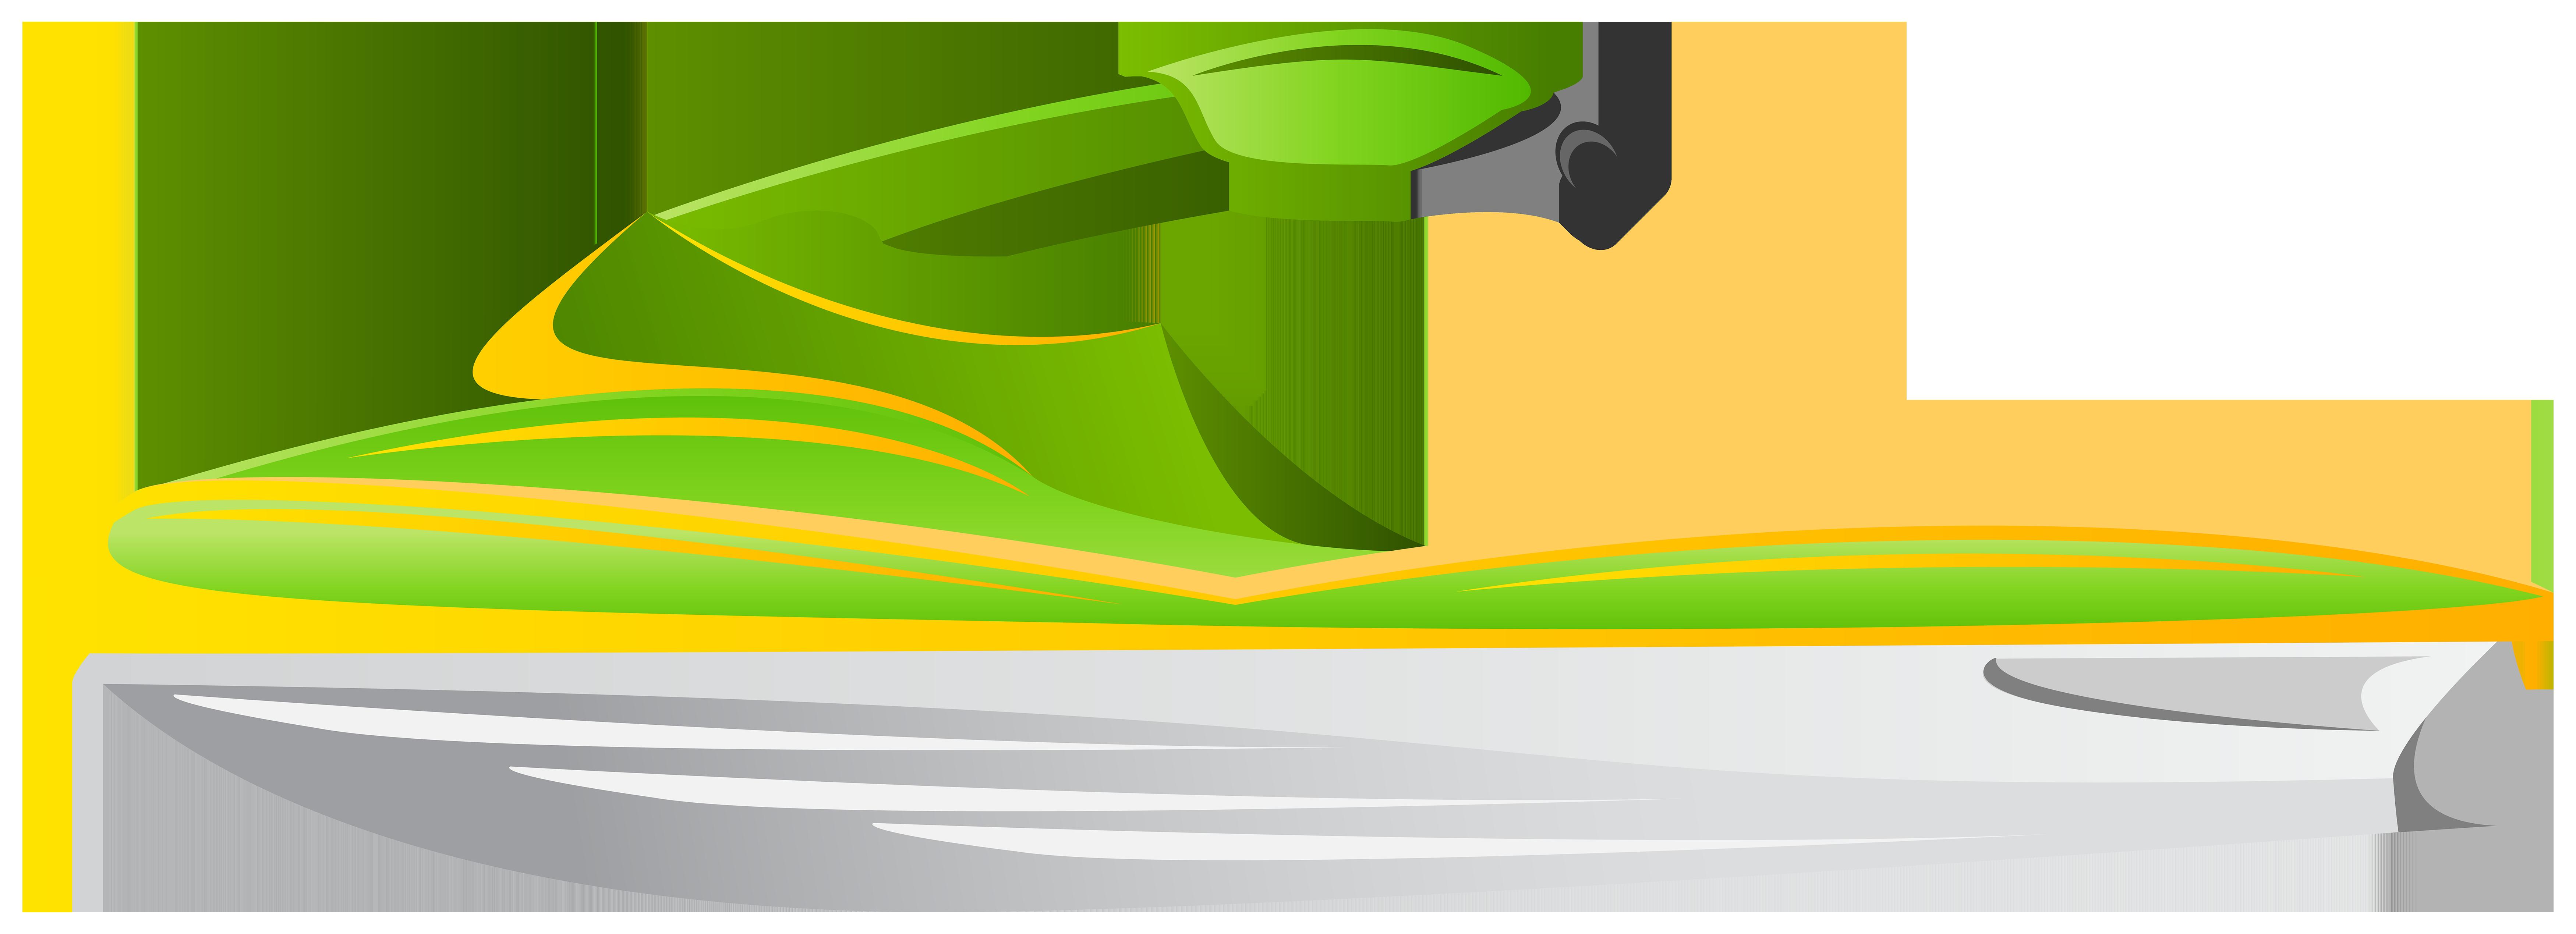 Free Speed Clipart Best Symbol Clip Art ⋆ ClipartView.com.